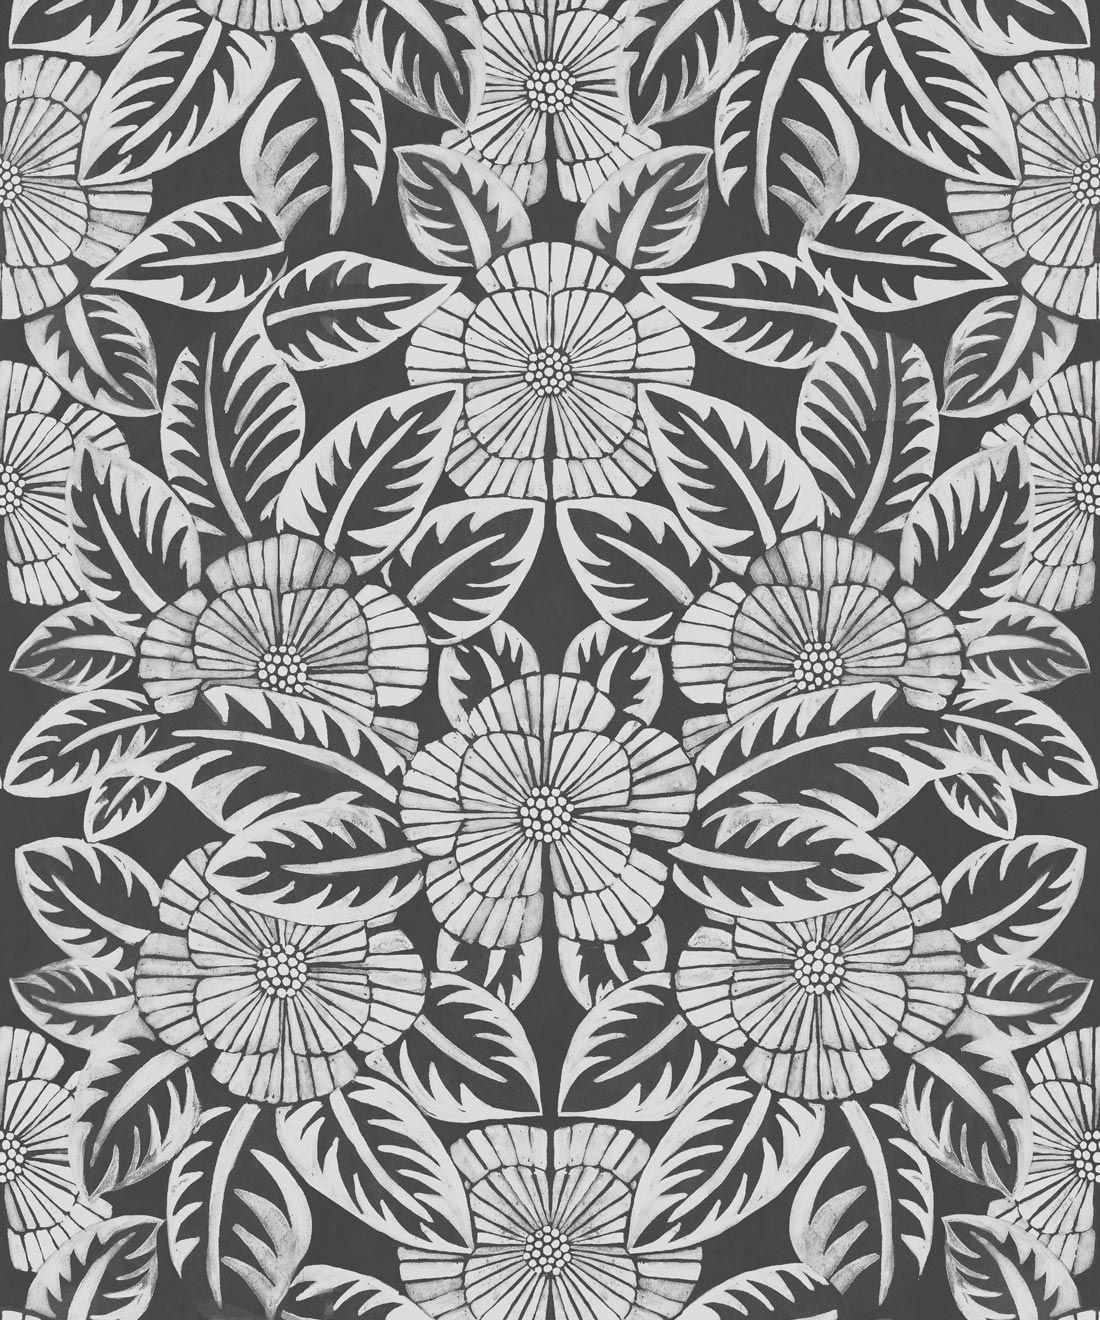 Calcutta Wallpaper • Flower and Leaf Motif Design • Ethnic Wallpaper • Charcoal Wallpaper • Swatch